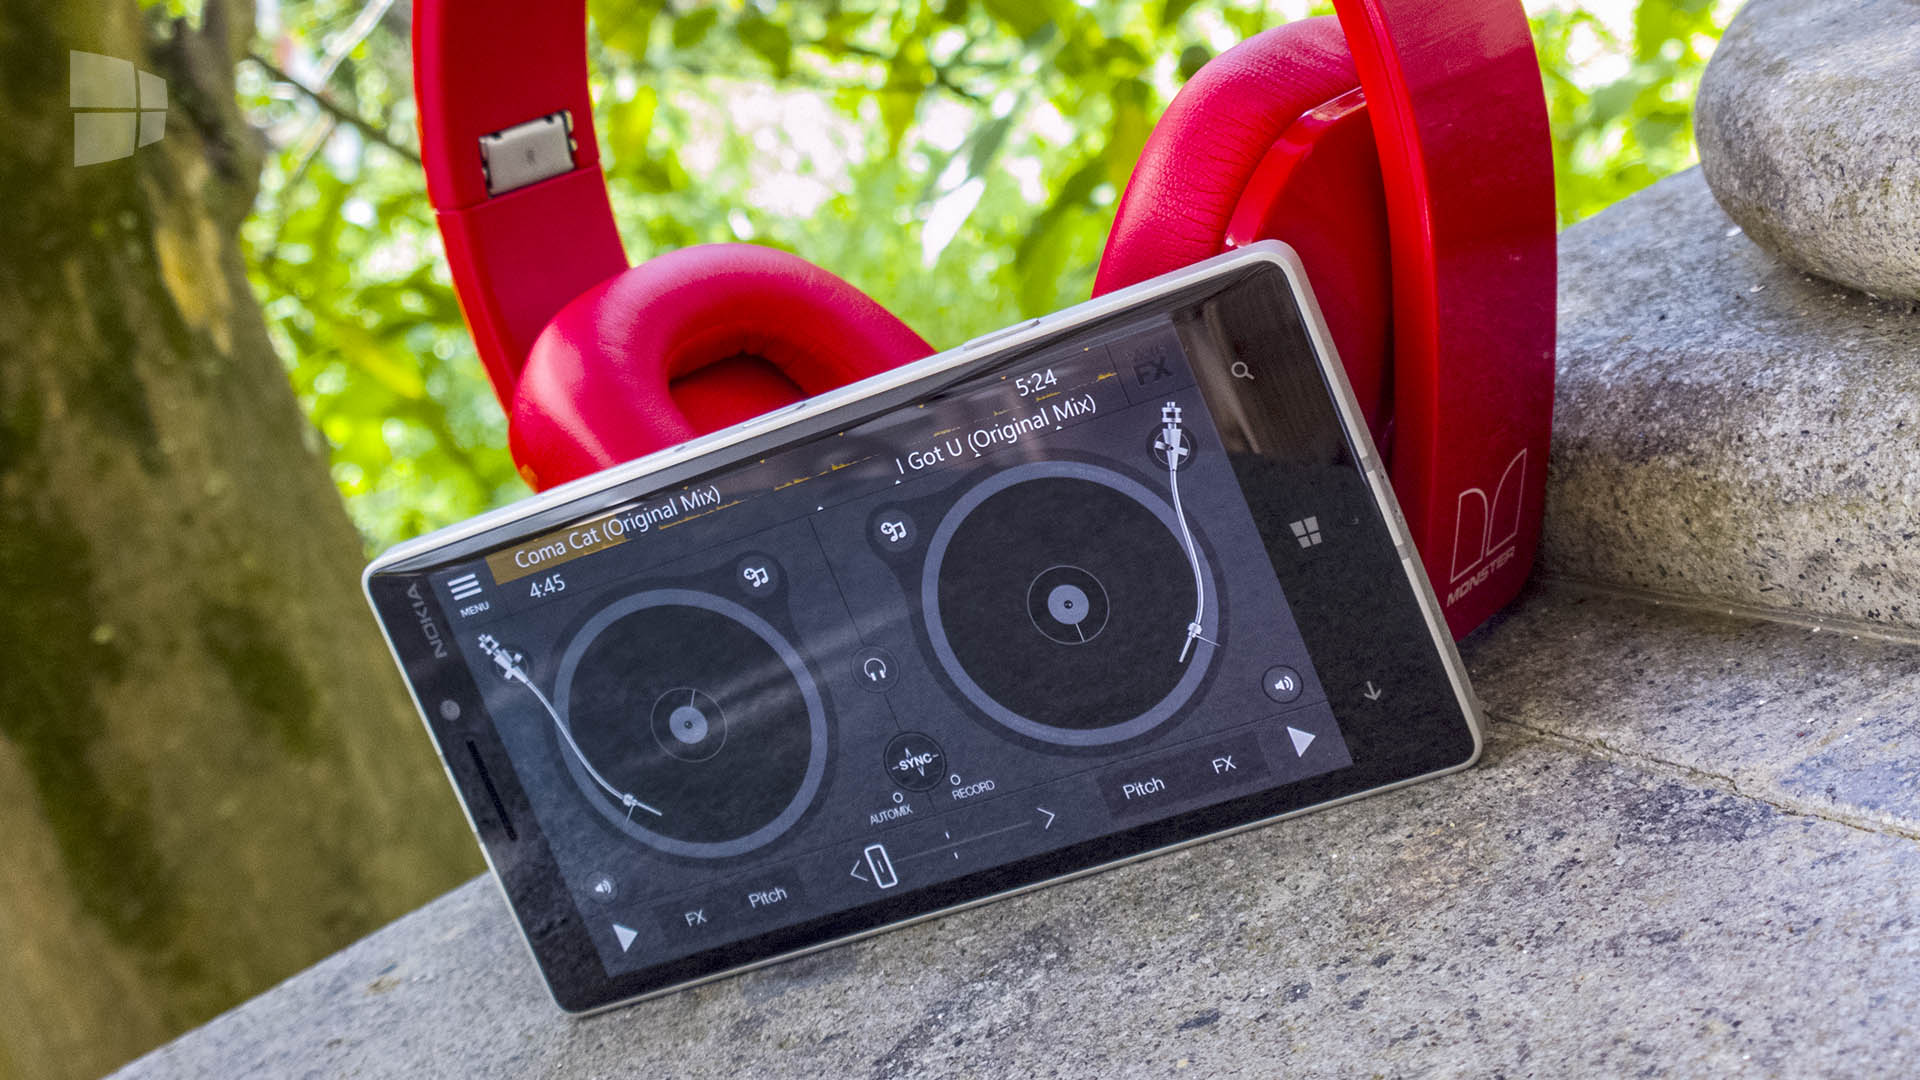 edjing for Windows Phone